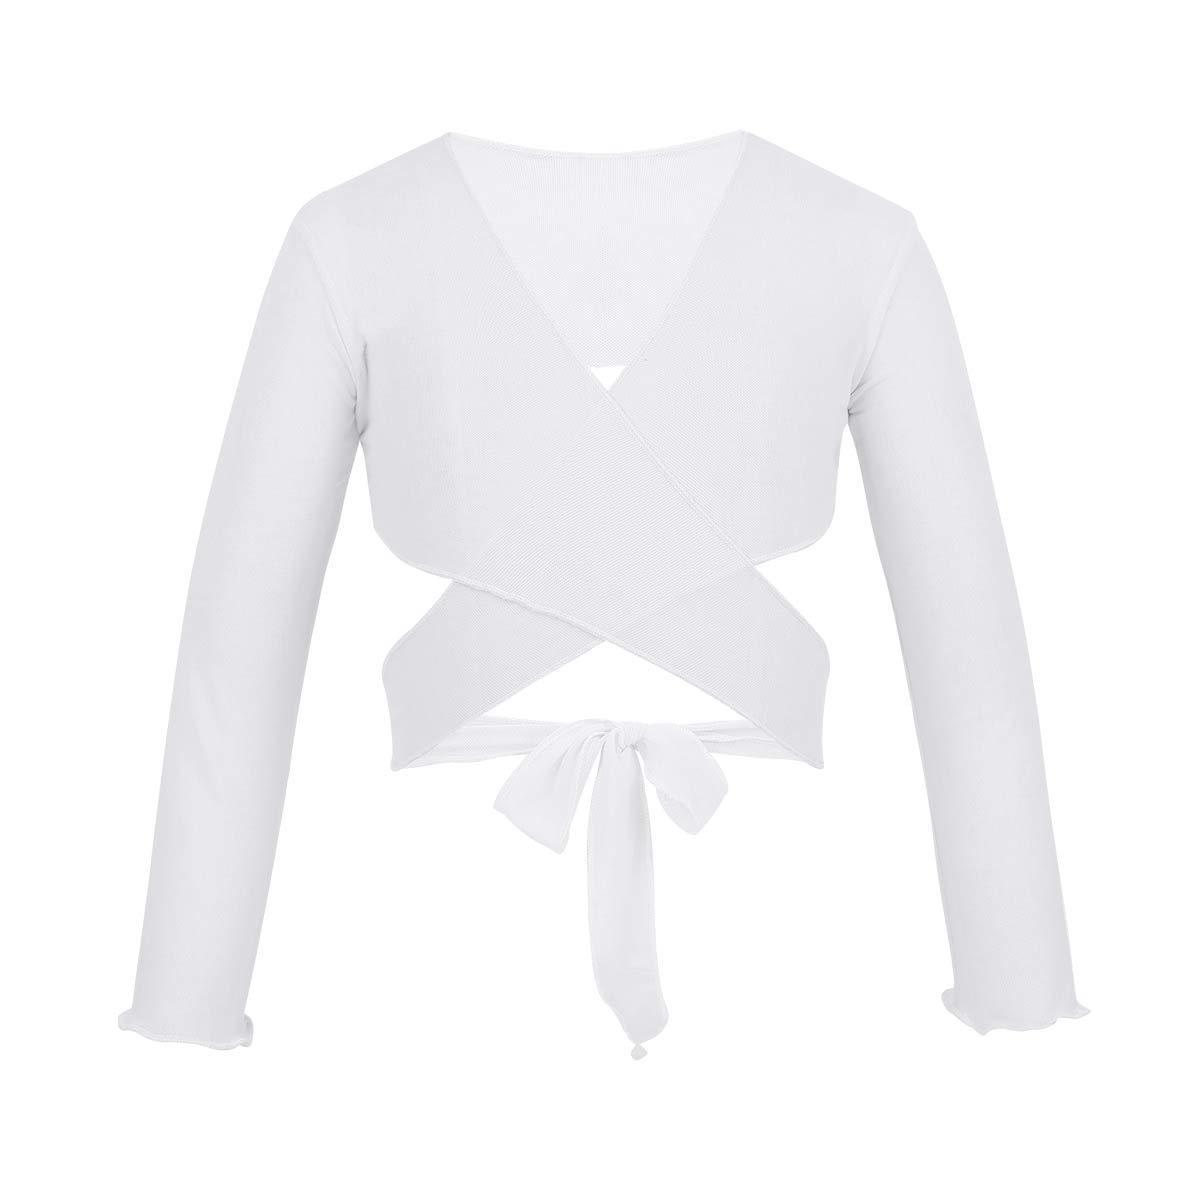 iEFiEL Girls Front Twist Knot Long Sleeve Ballerina Dance Cotton Wrap Top White Mesh 7-8 by iEFiEL